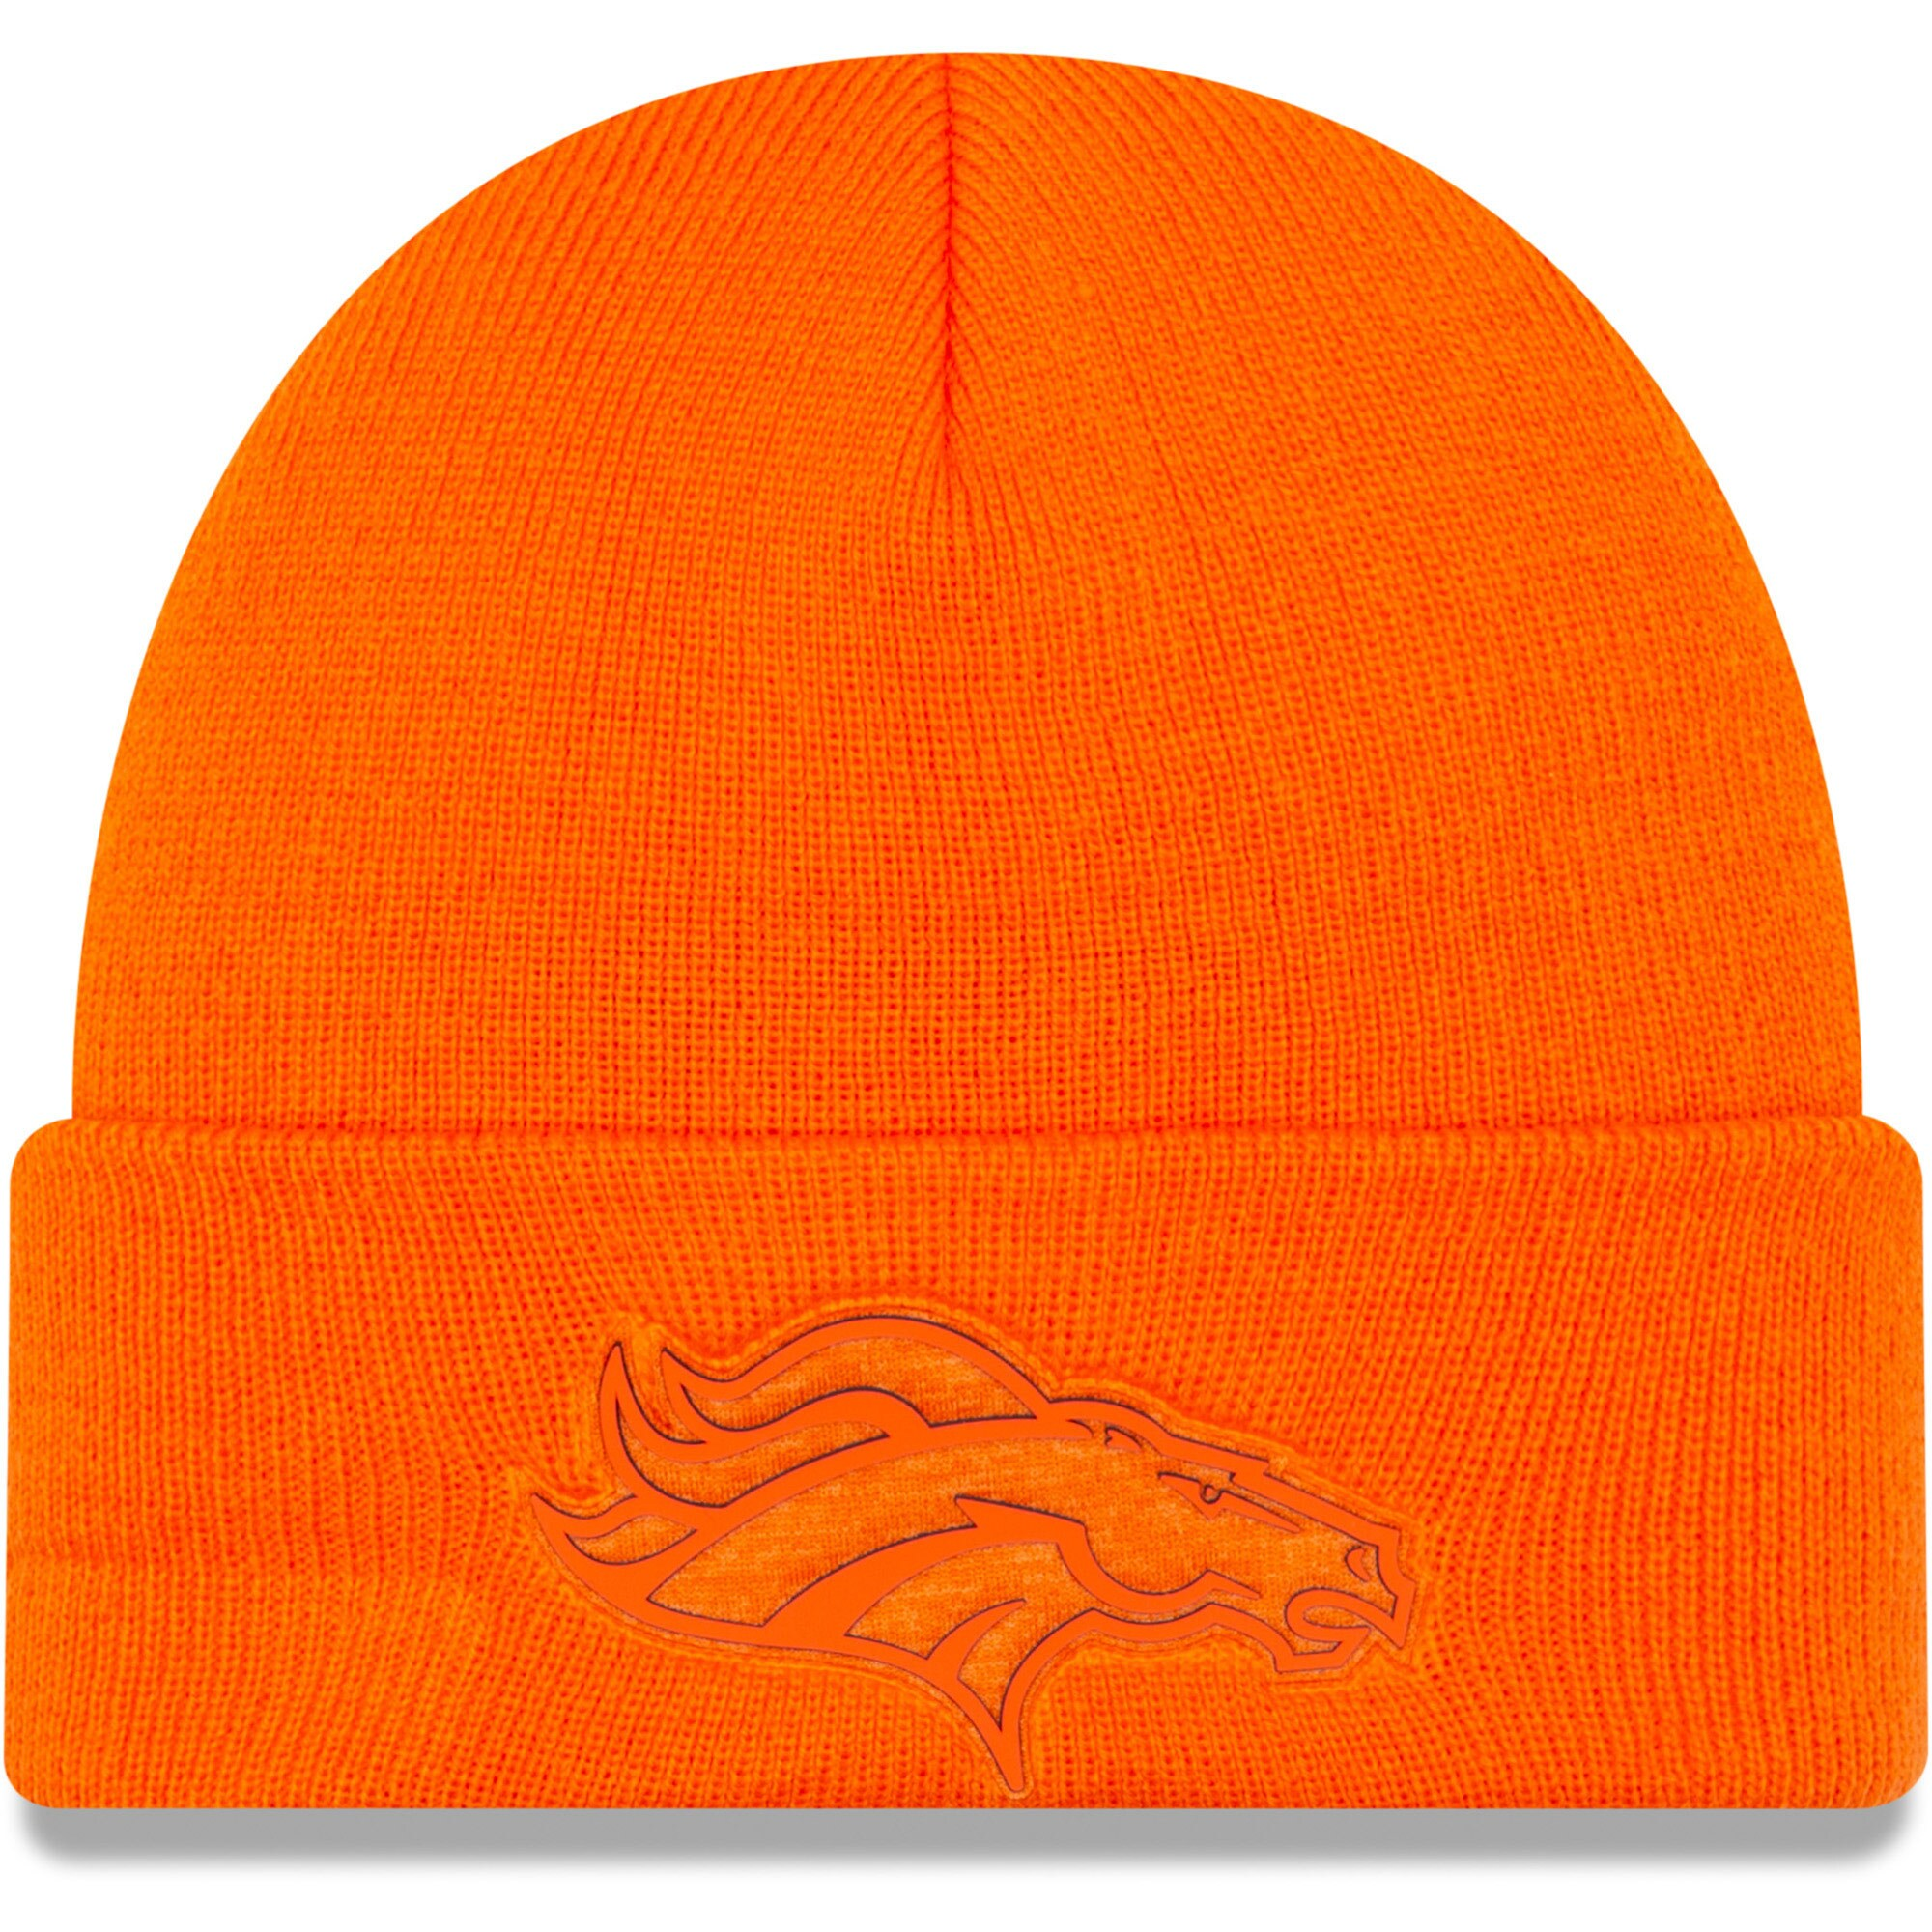 Denver Broncos New Era Vivid Cuffed Knit Hat - Orange